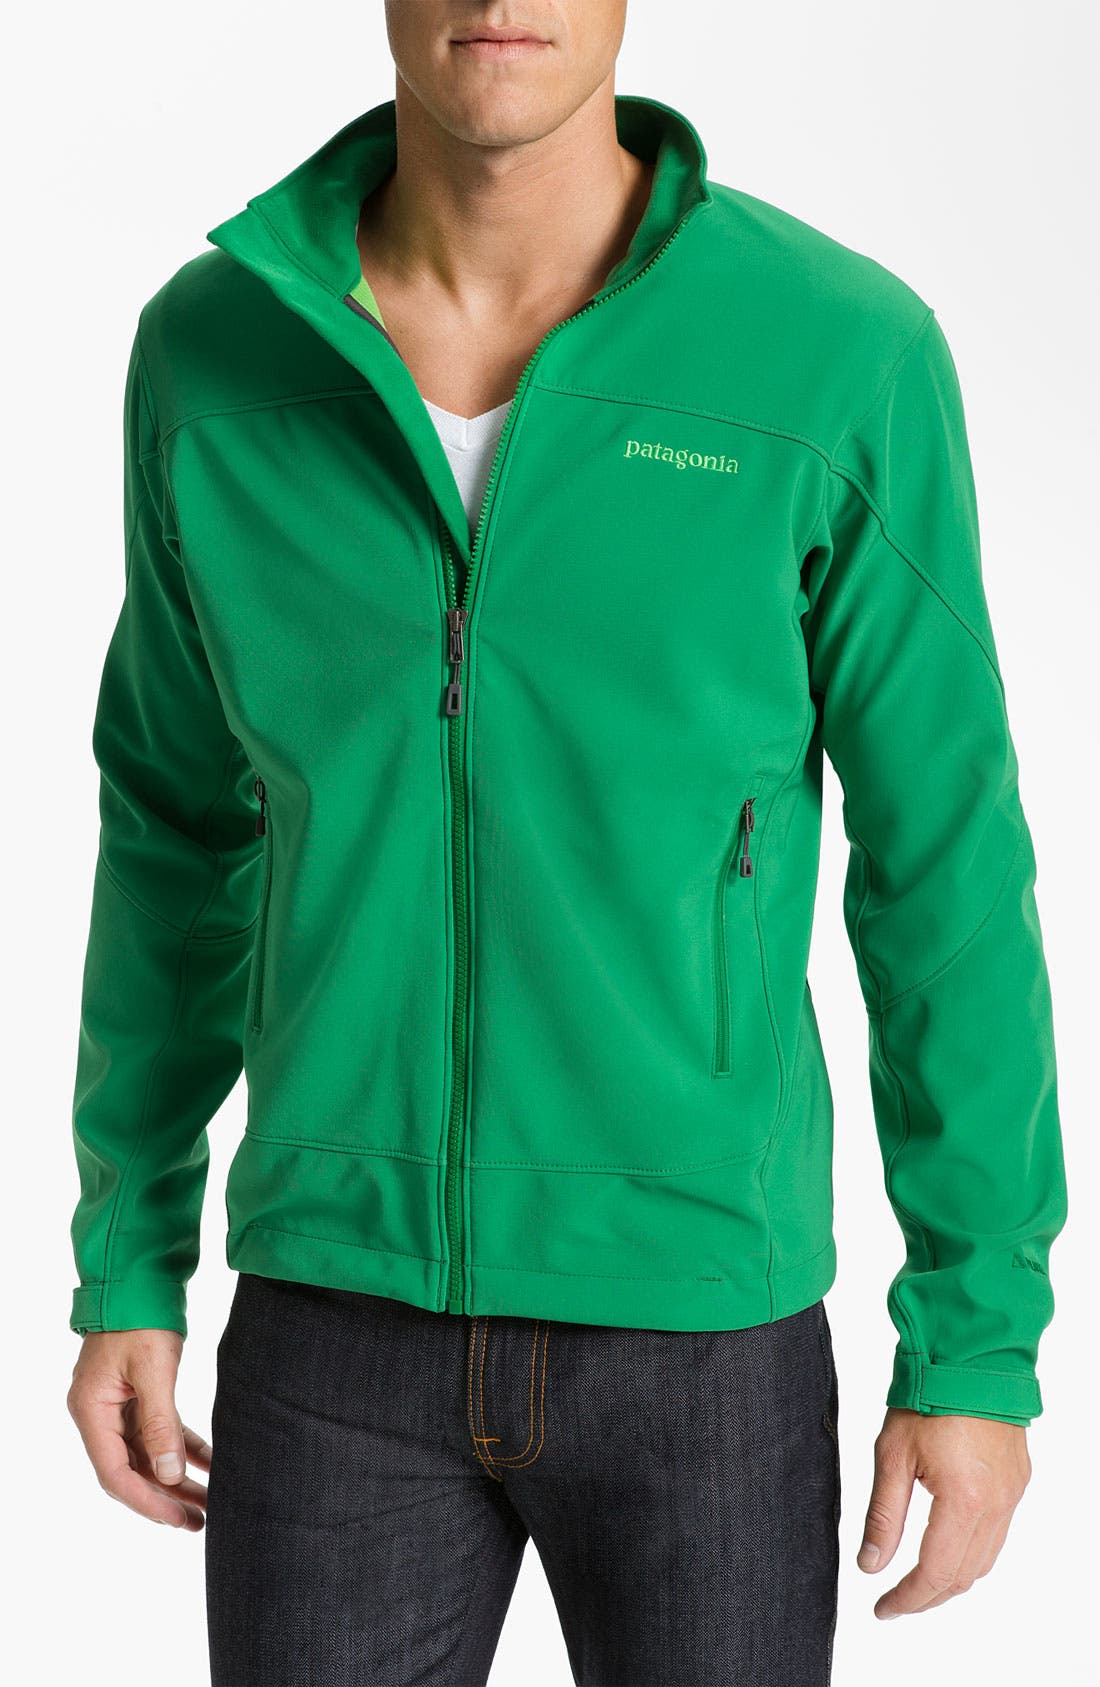 Alternate Image 1 Selected - Patagonia 'Adze' Zip Jacket